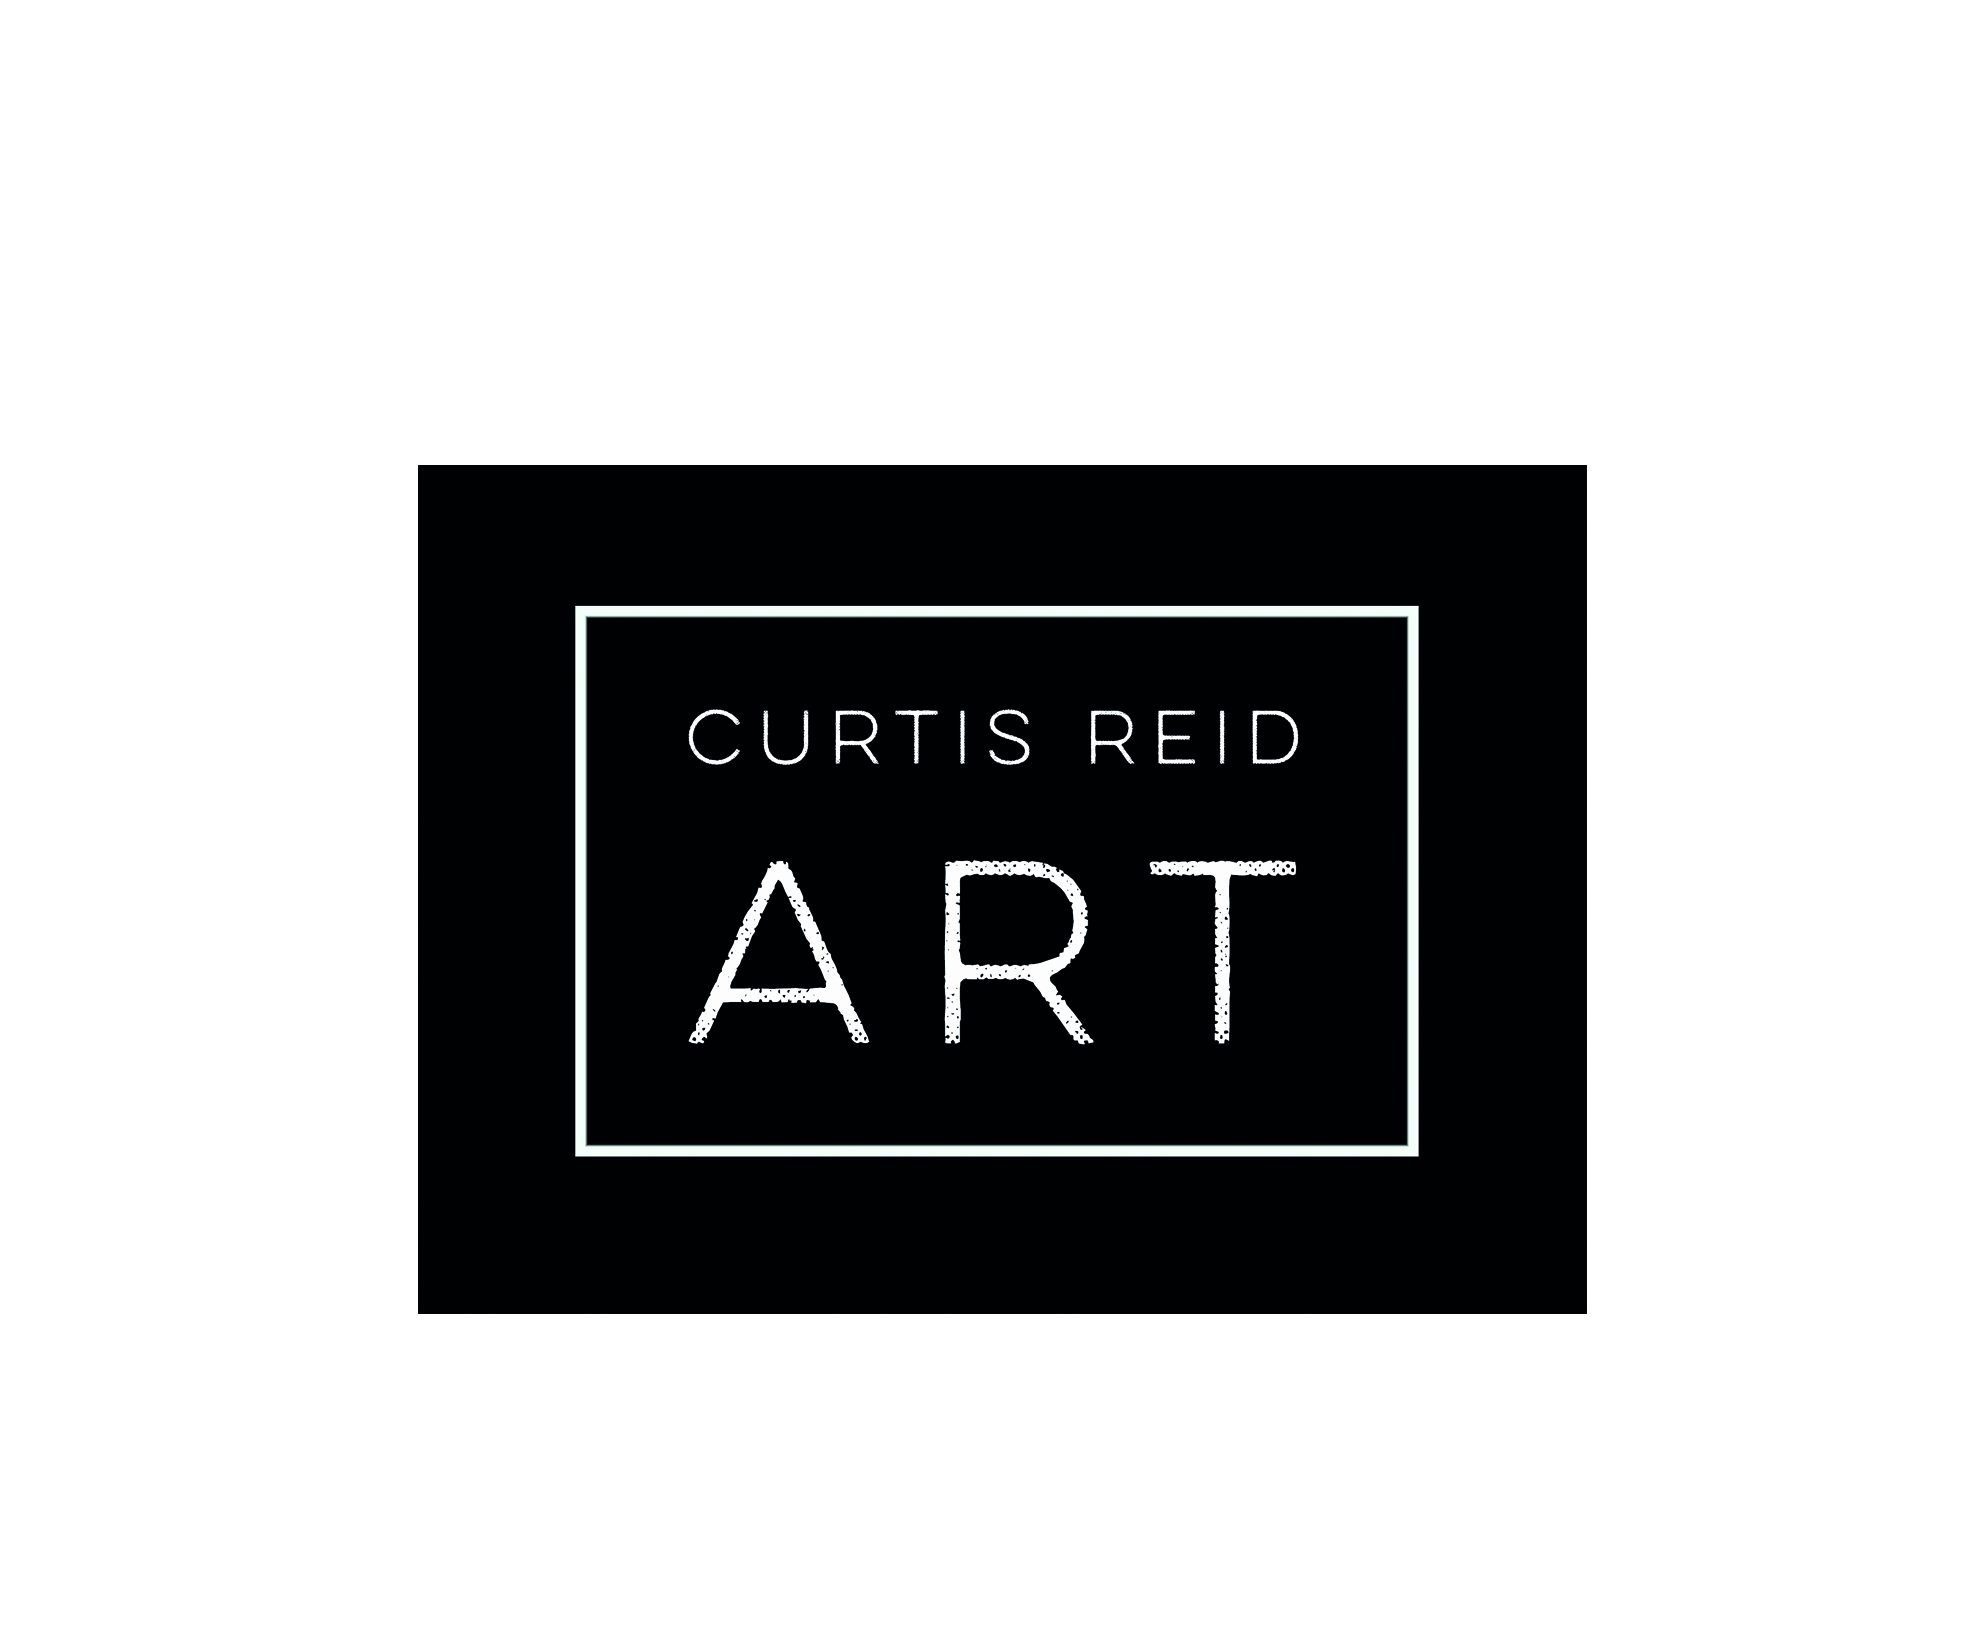 Curtis Reid Art